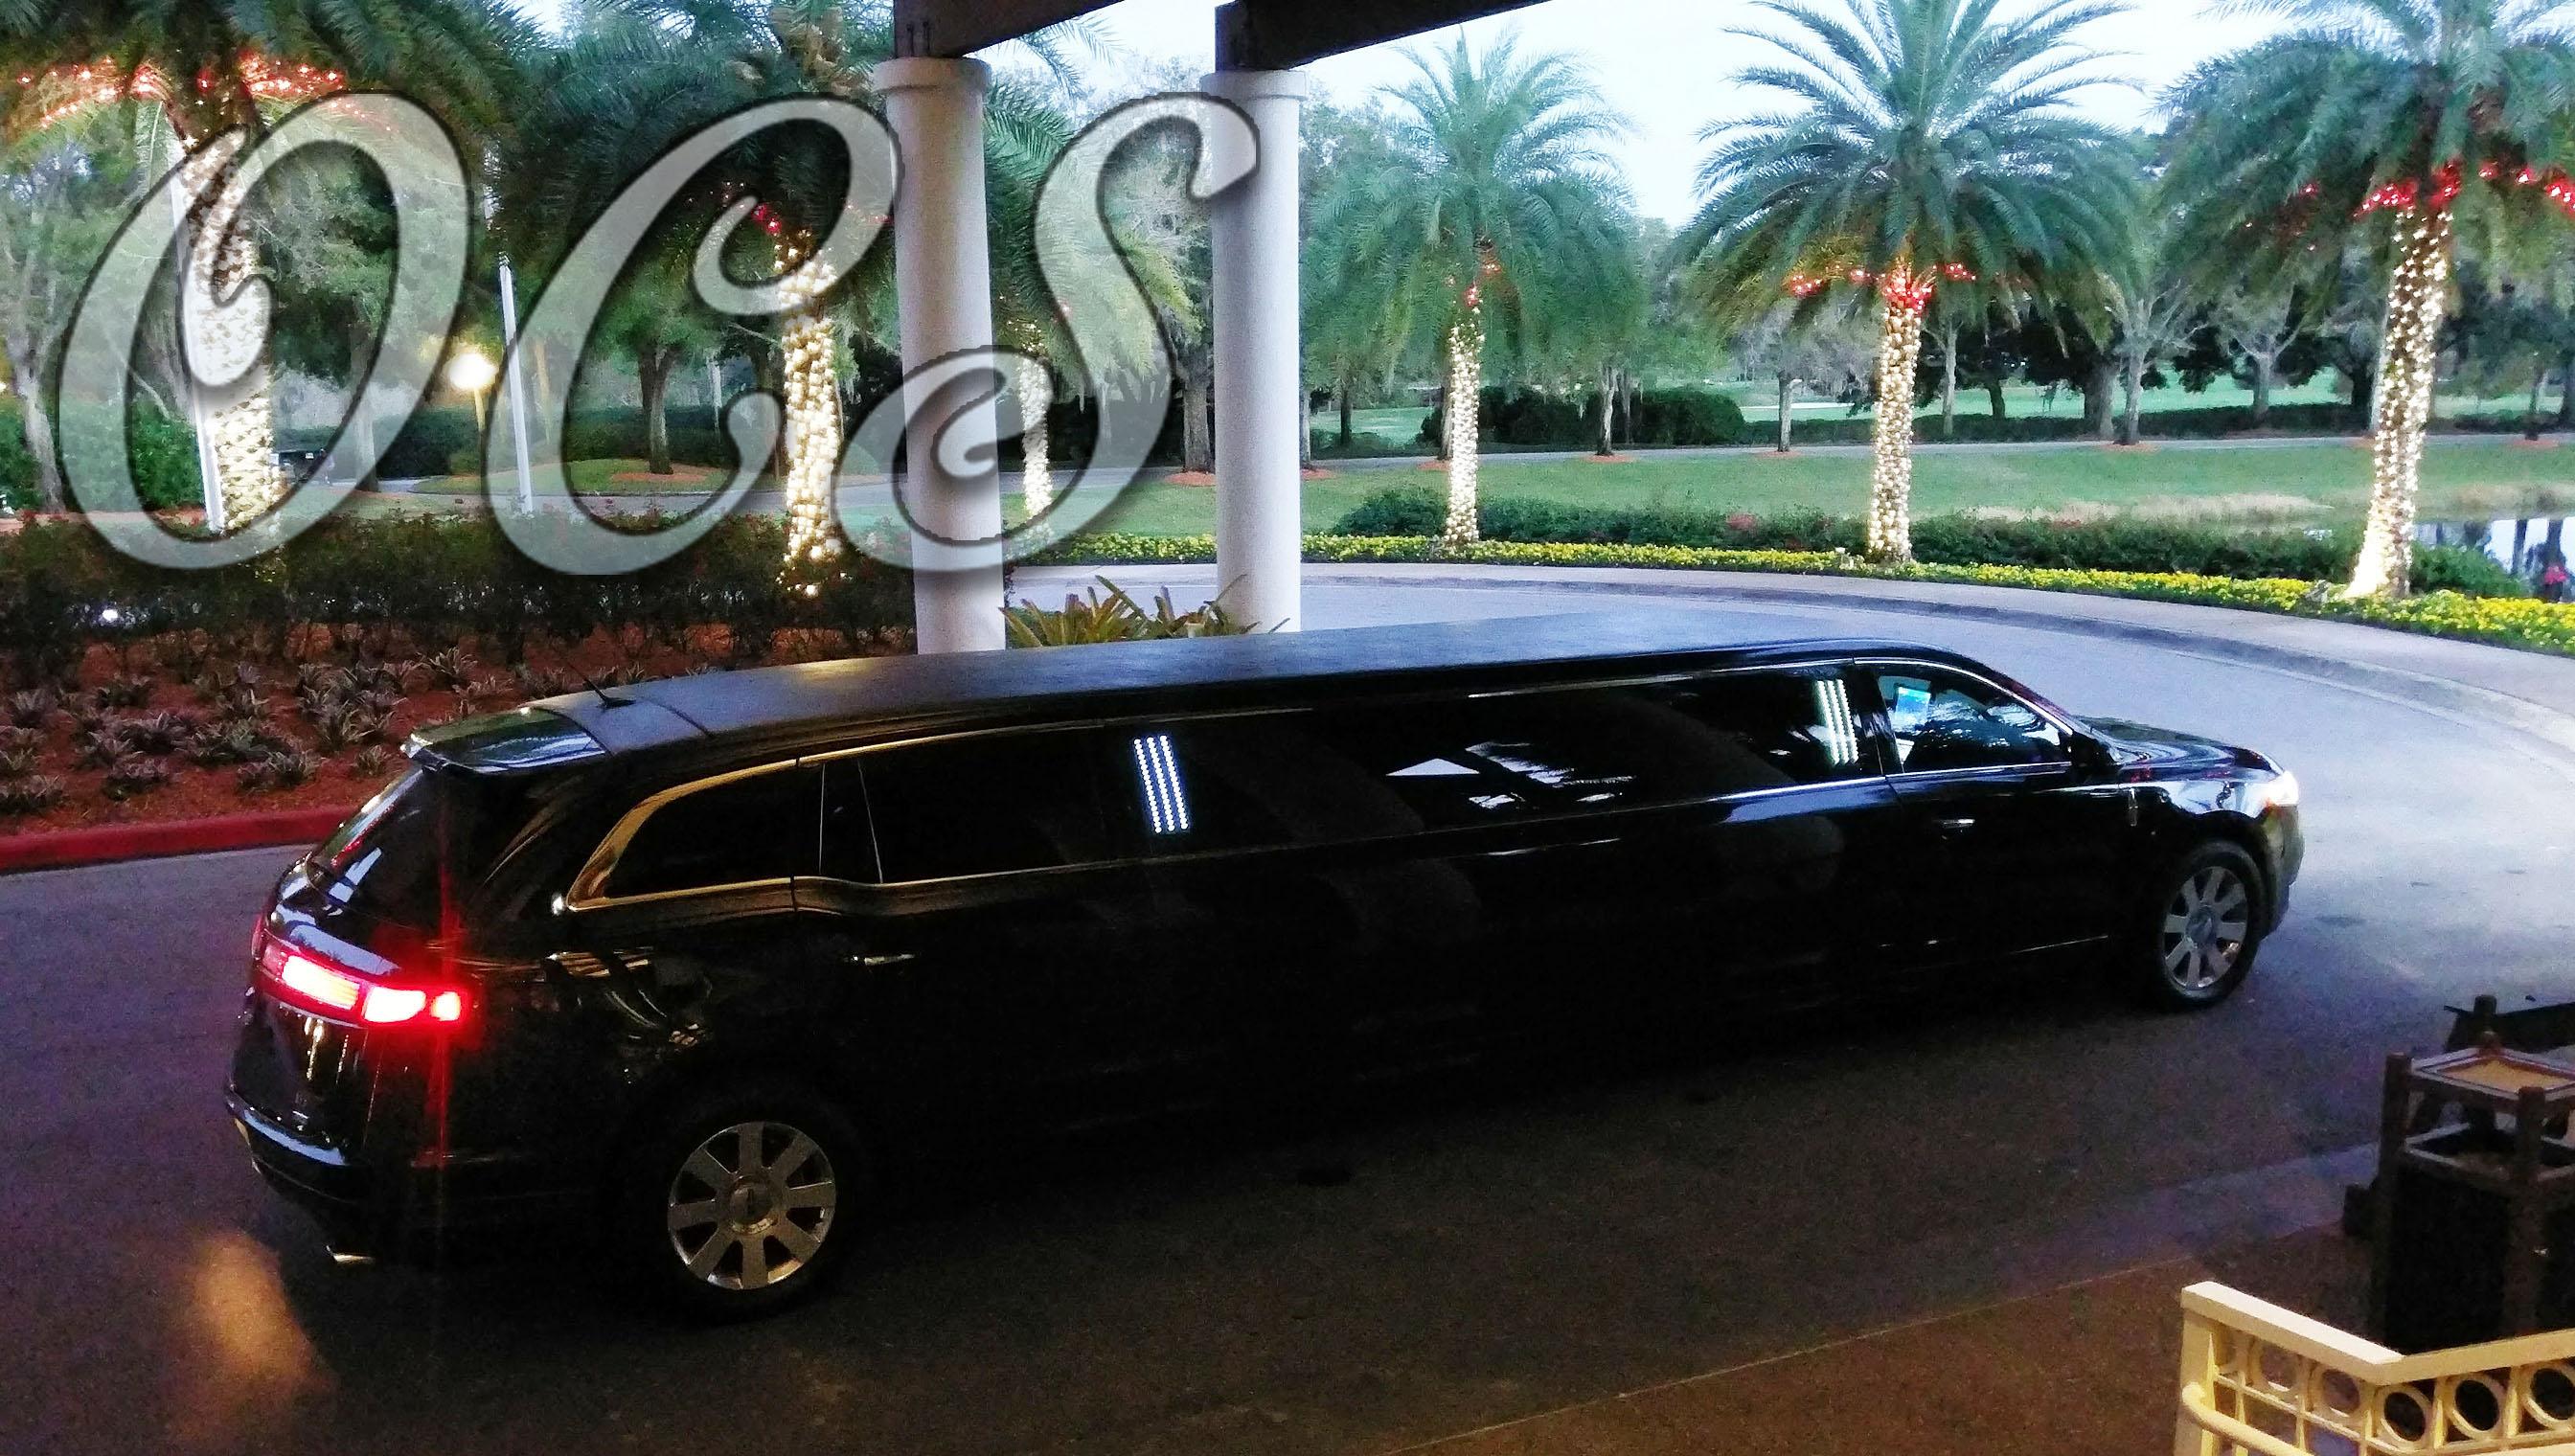 Orlando Limo • Orlando Airport Limo • Limousine Service Orlando FL